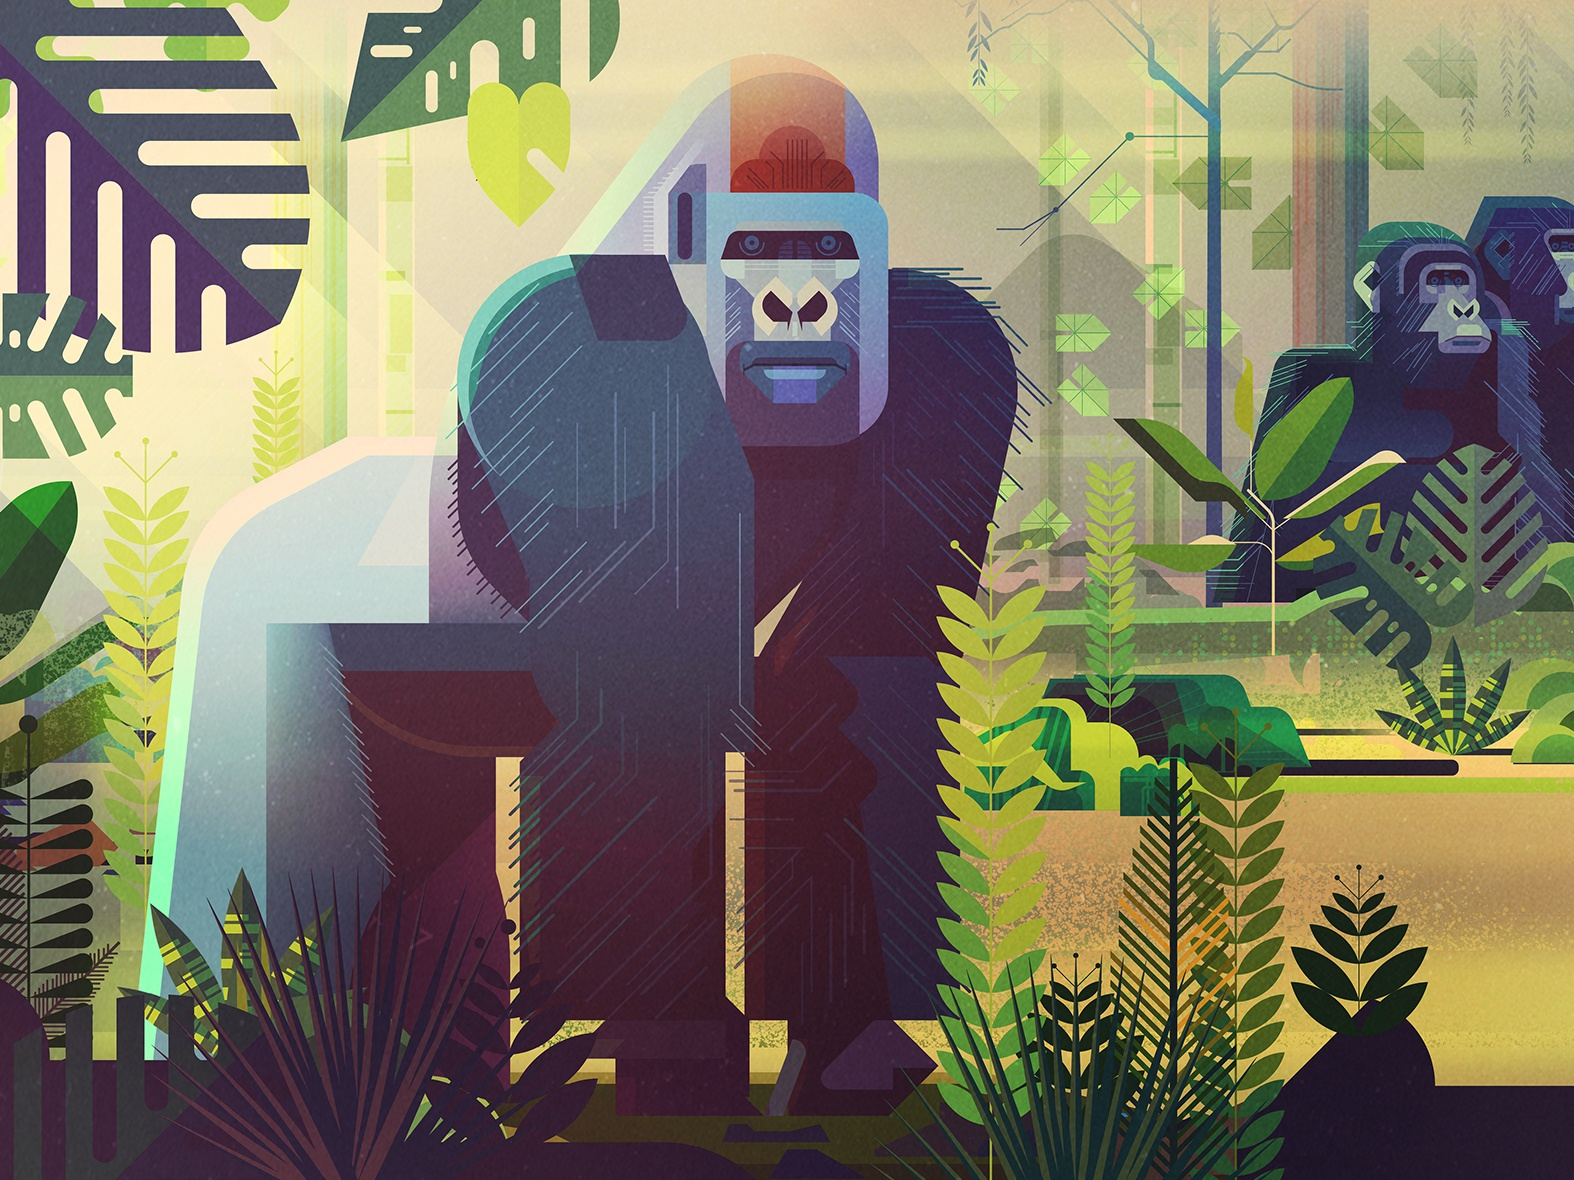 Saving Species spread book endangered species animals retro digital vector james gilleard